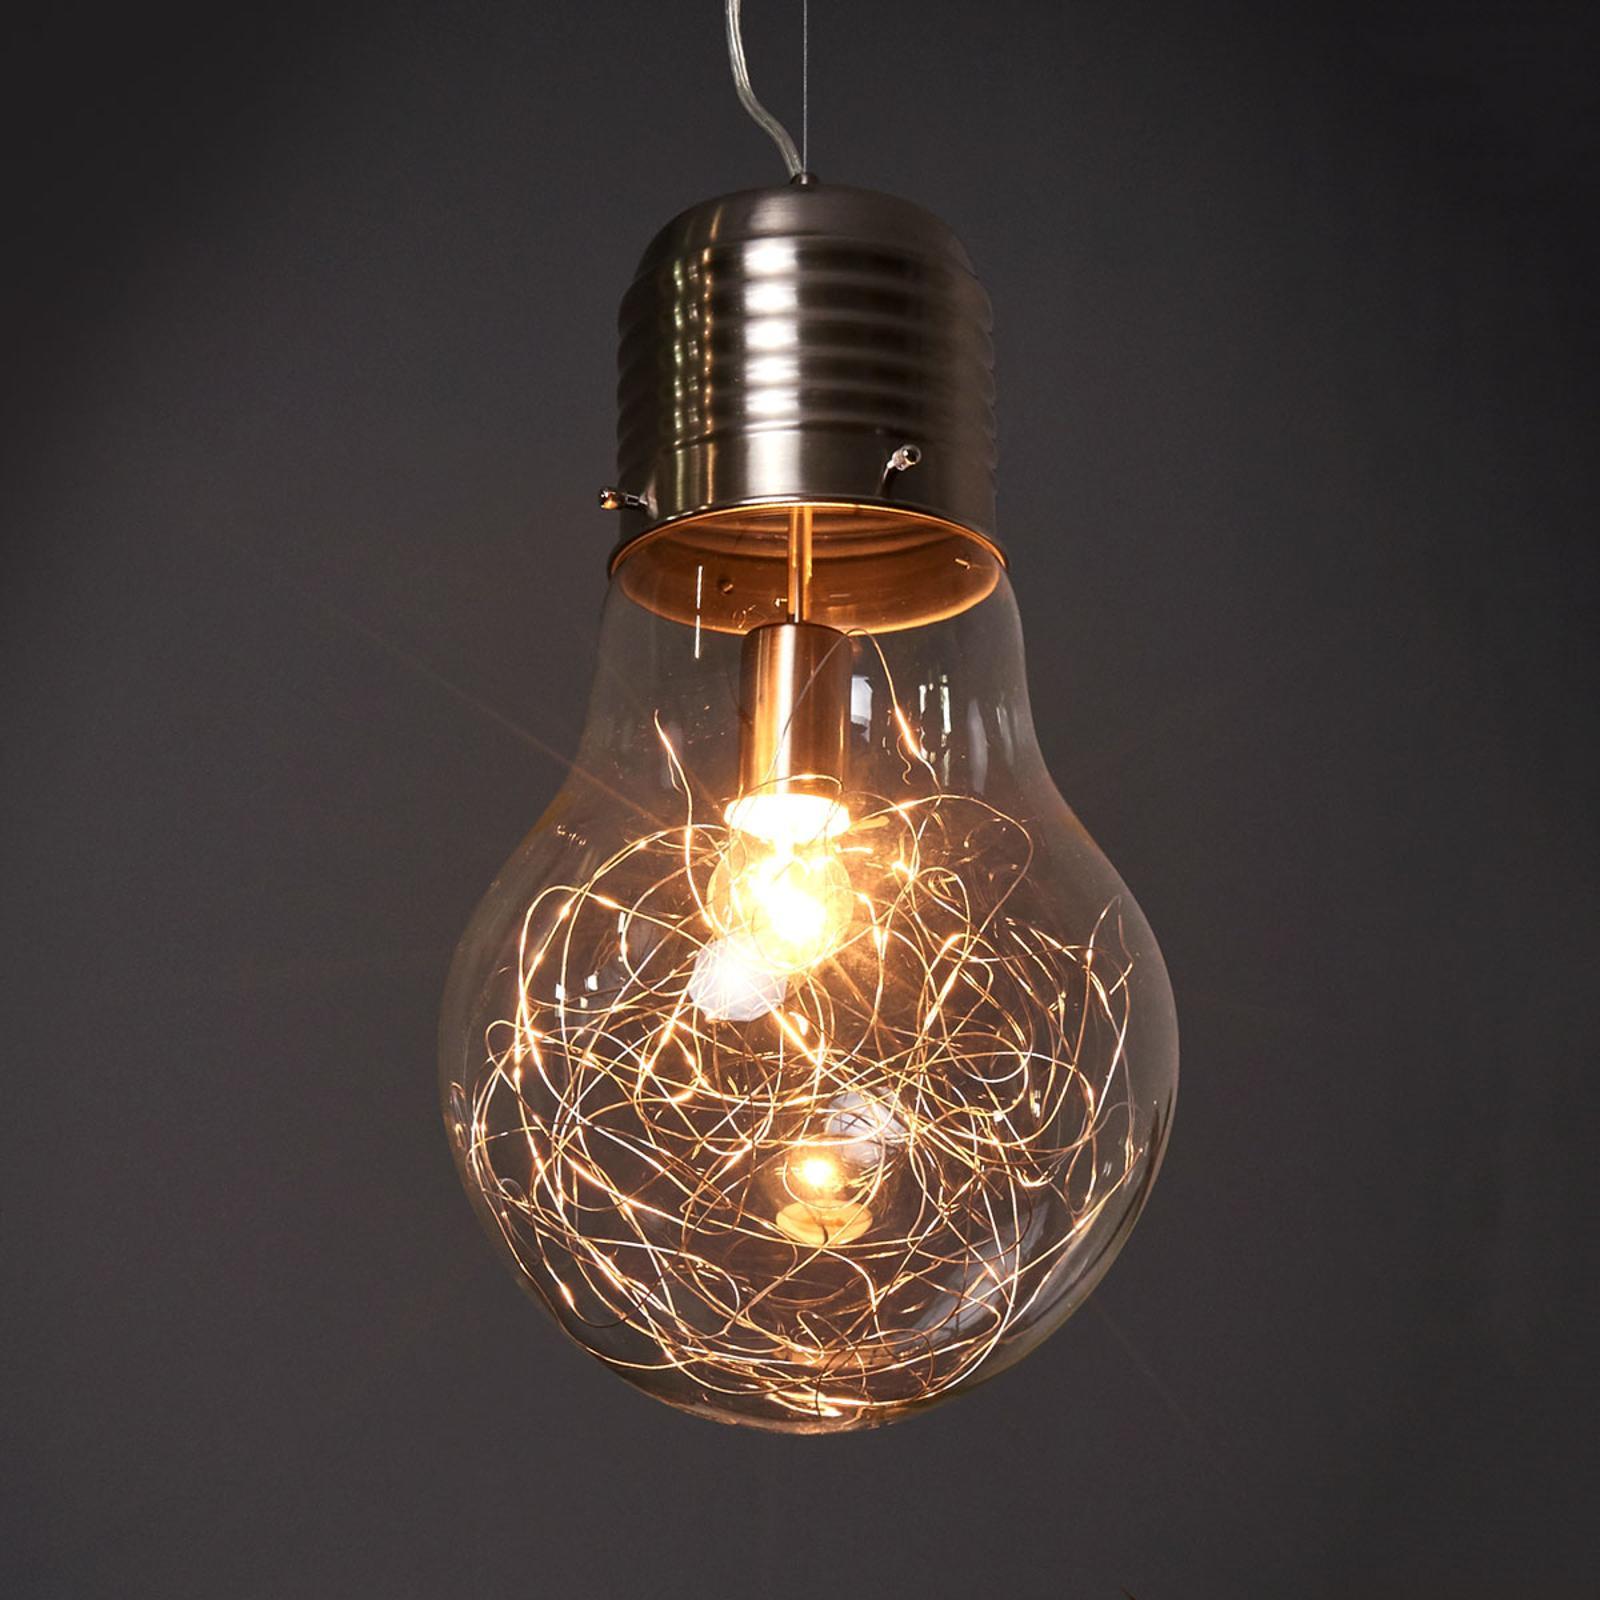 Pendelleuchte Glühbirnen Optik